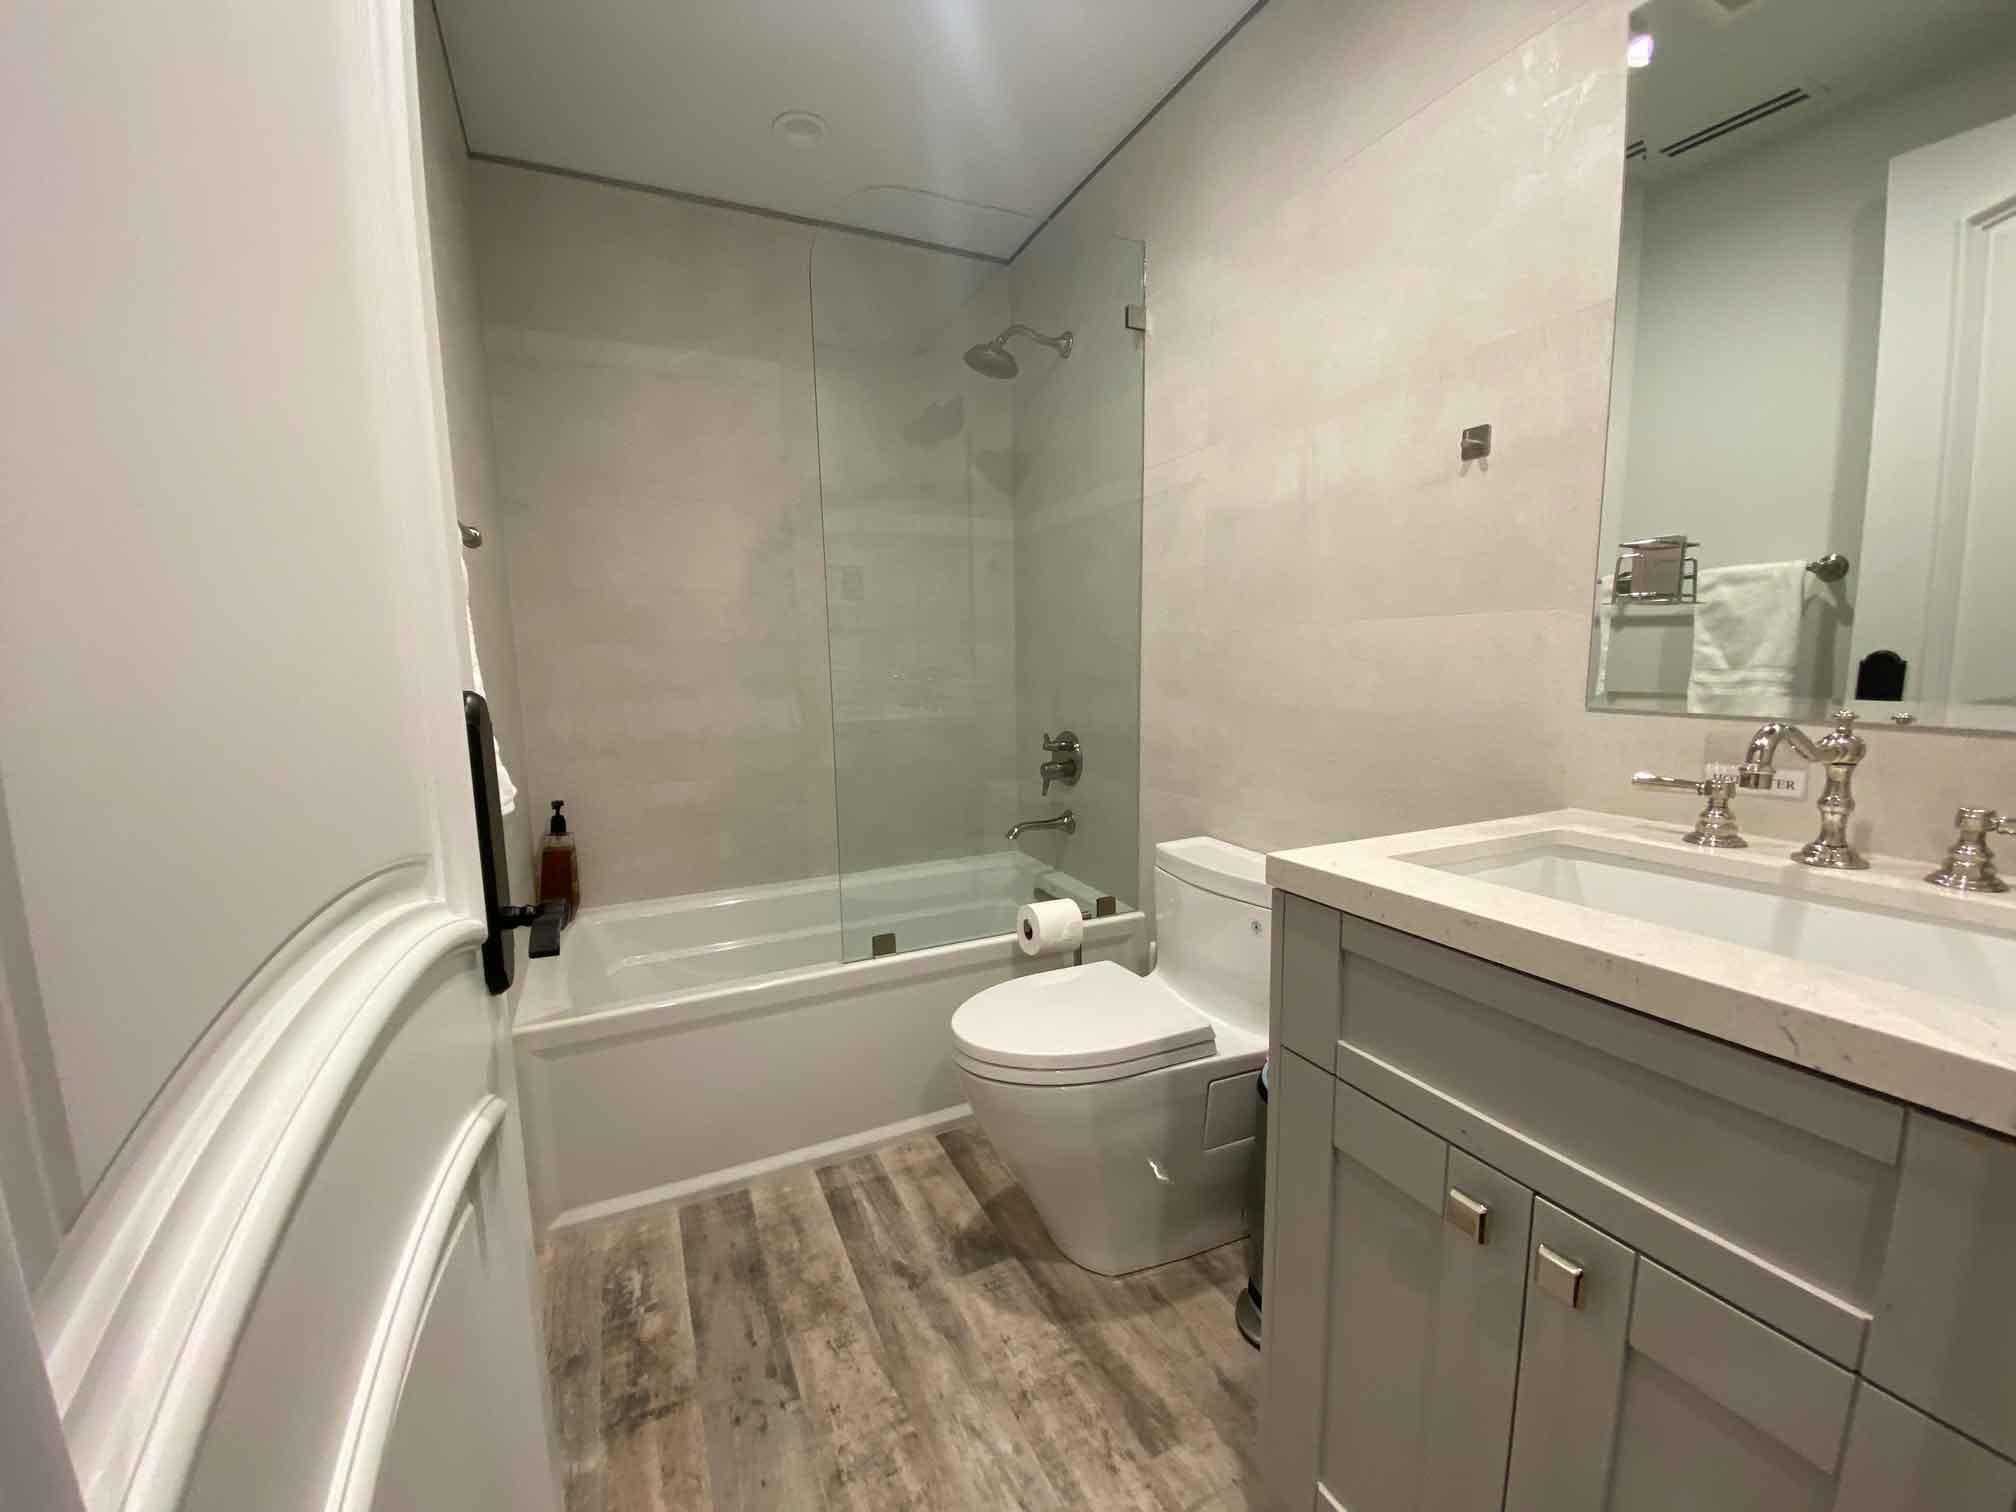 Residential-addiction-center-bathroom